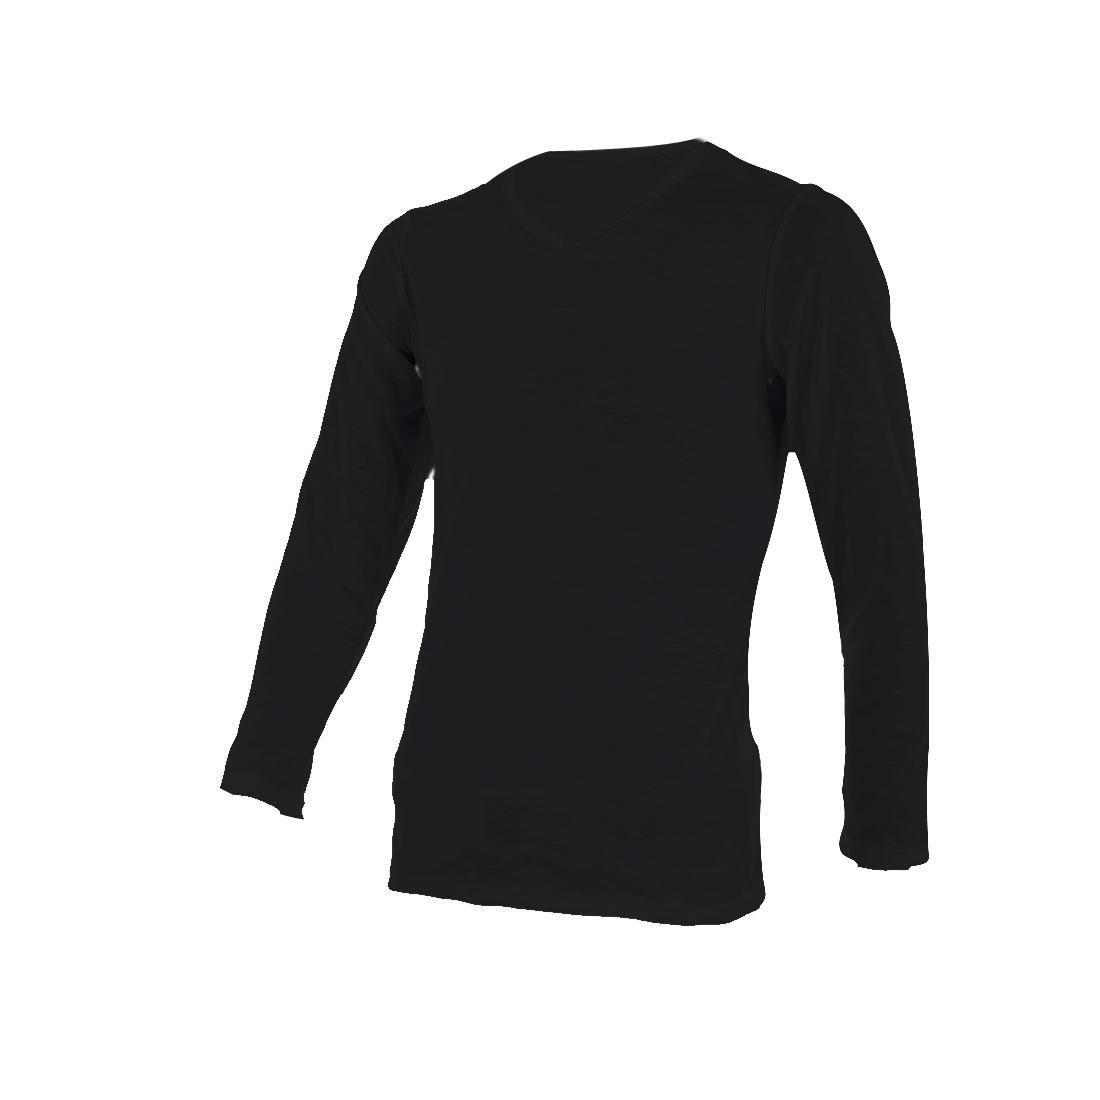 Men V Neck Long Sleeve Spring Wearing T-shirt Black S